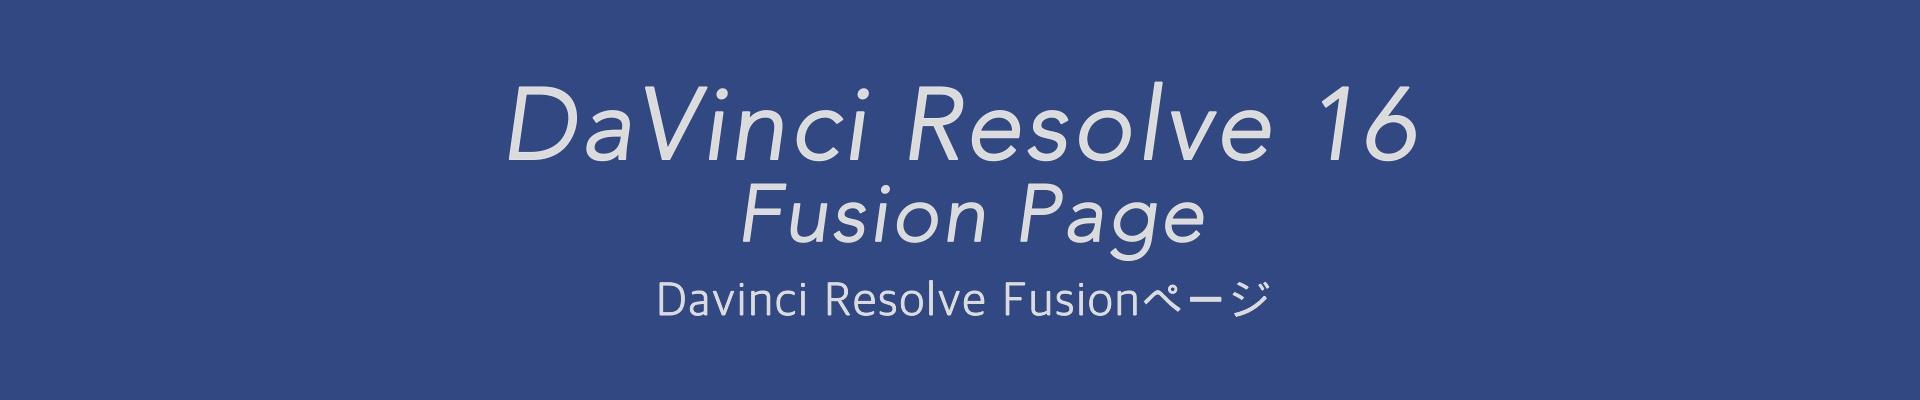 DaVinci Resolve 16 Fusion ページ